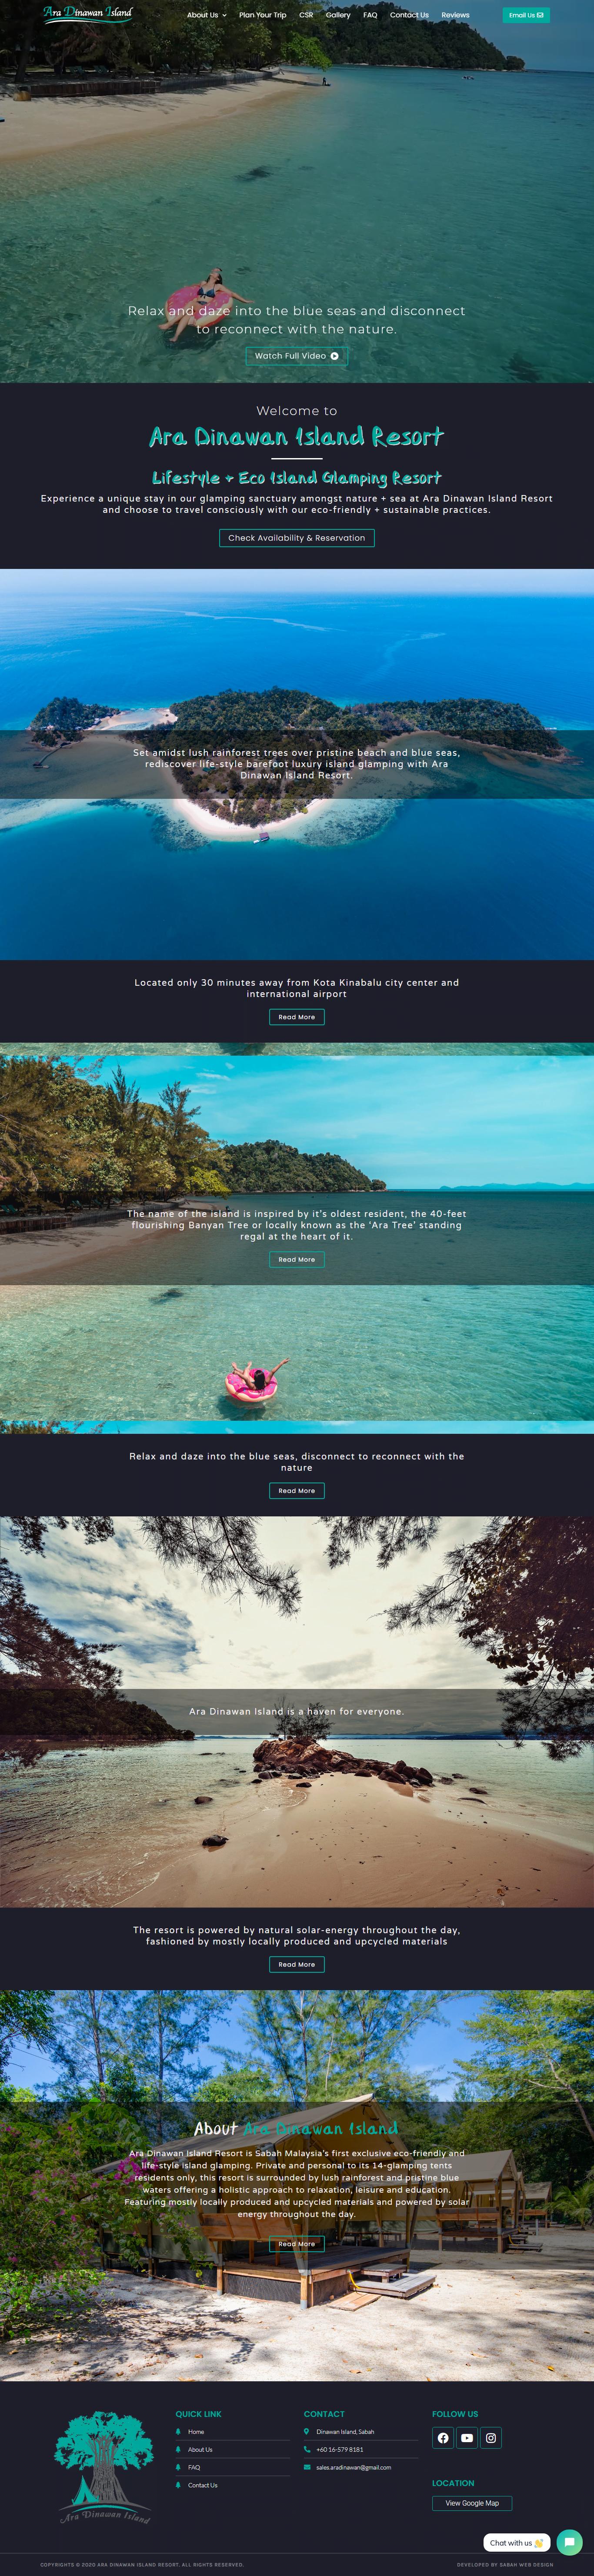 Ara Dinawan Island